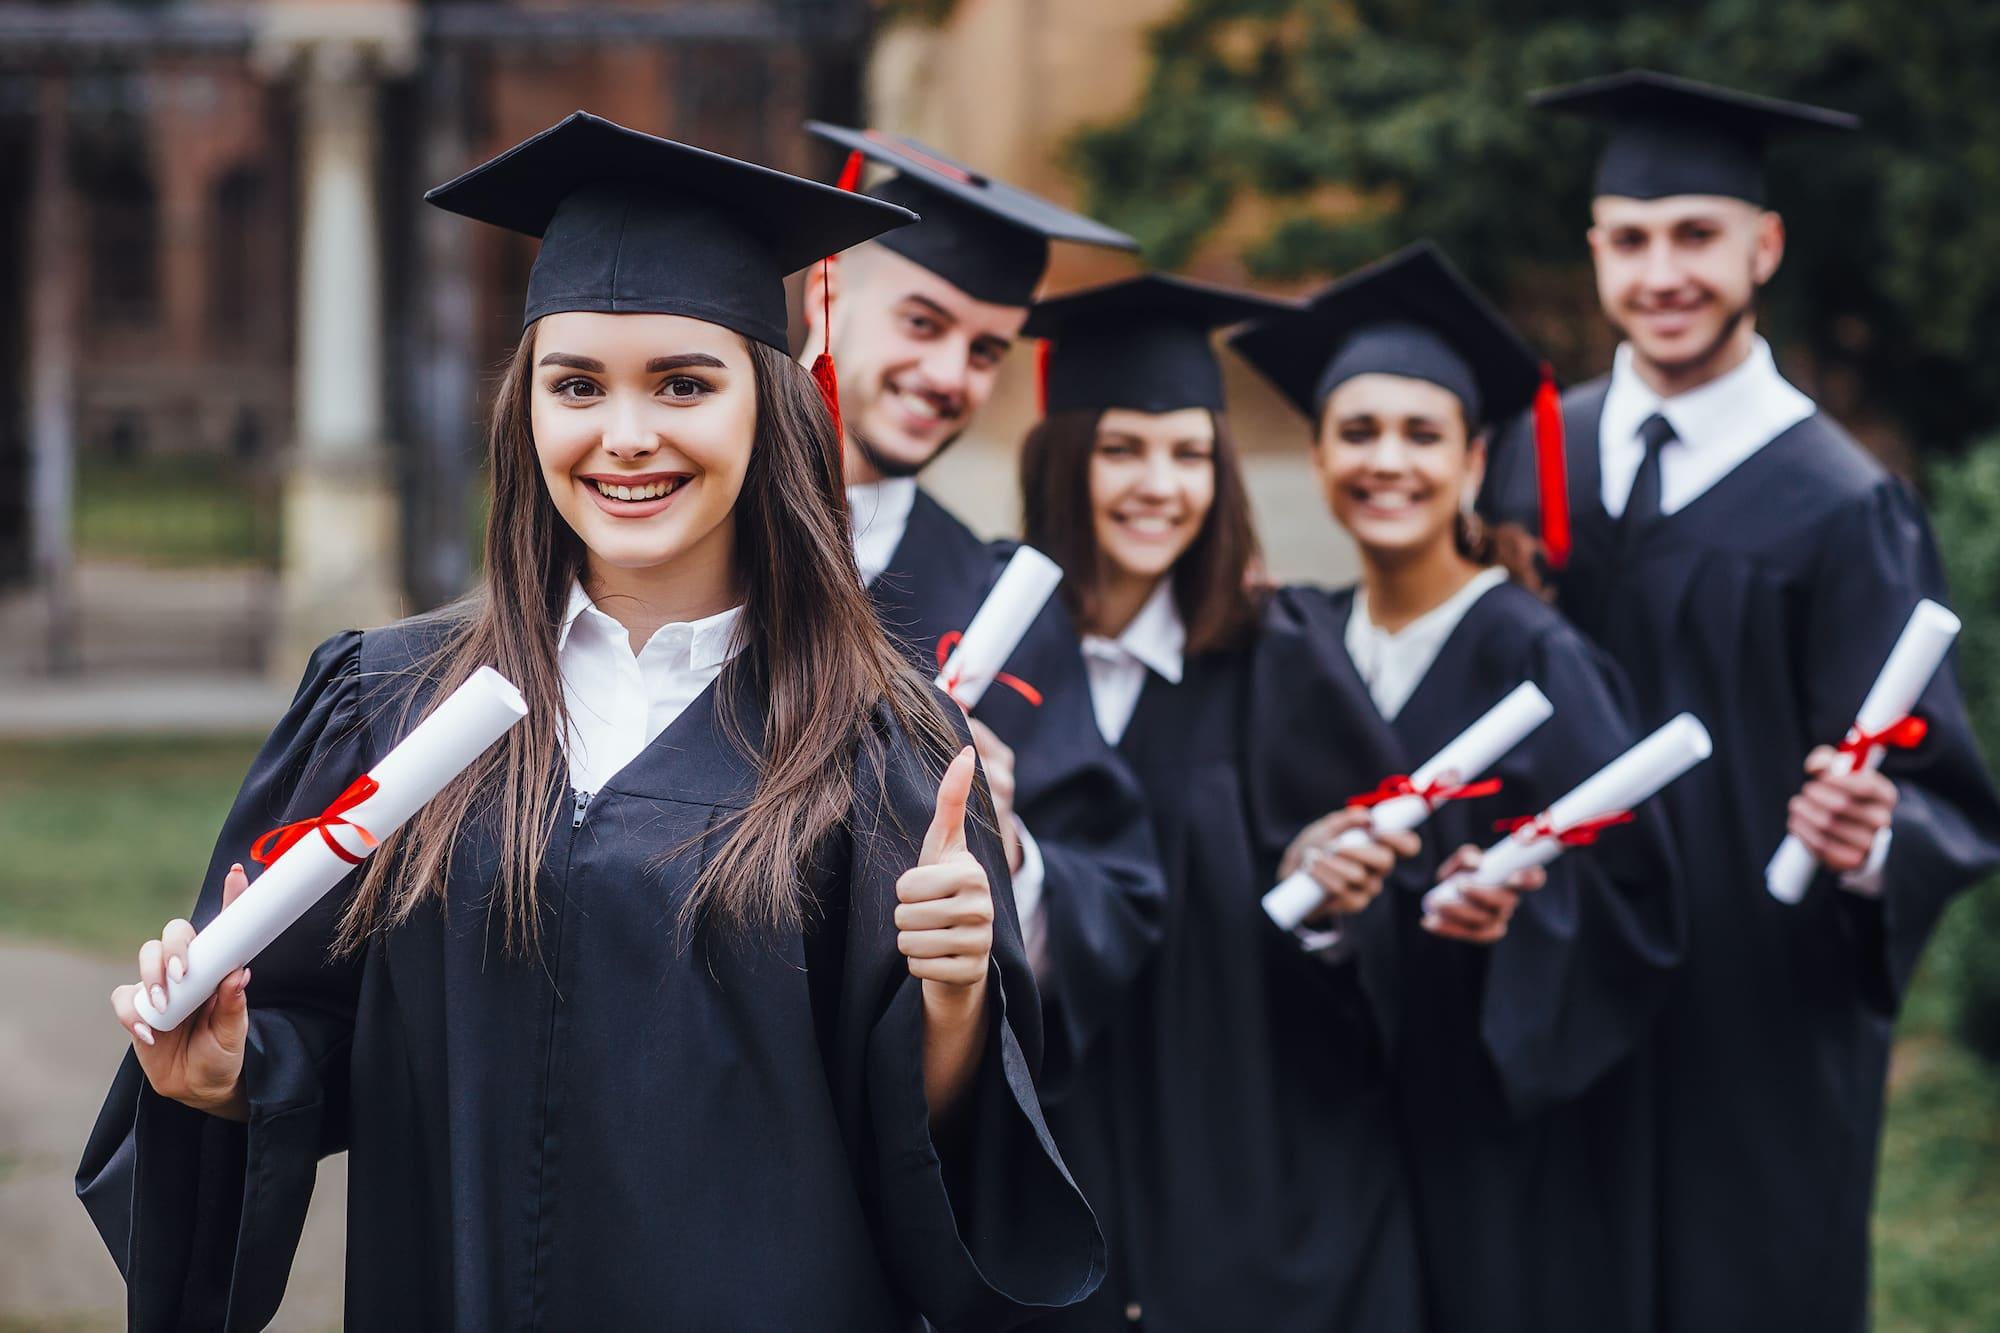 students_graduation.jpg